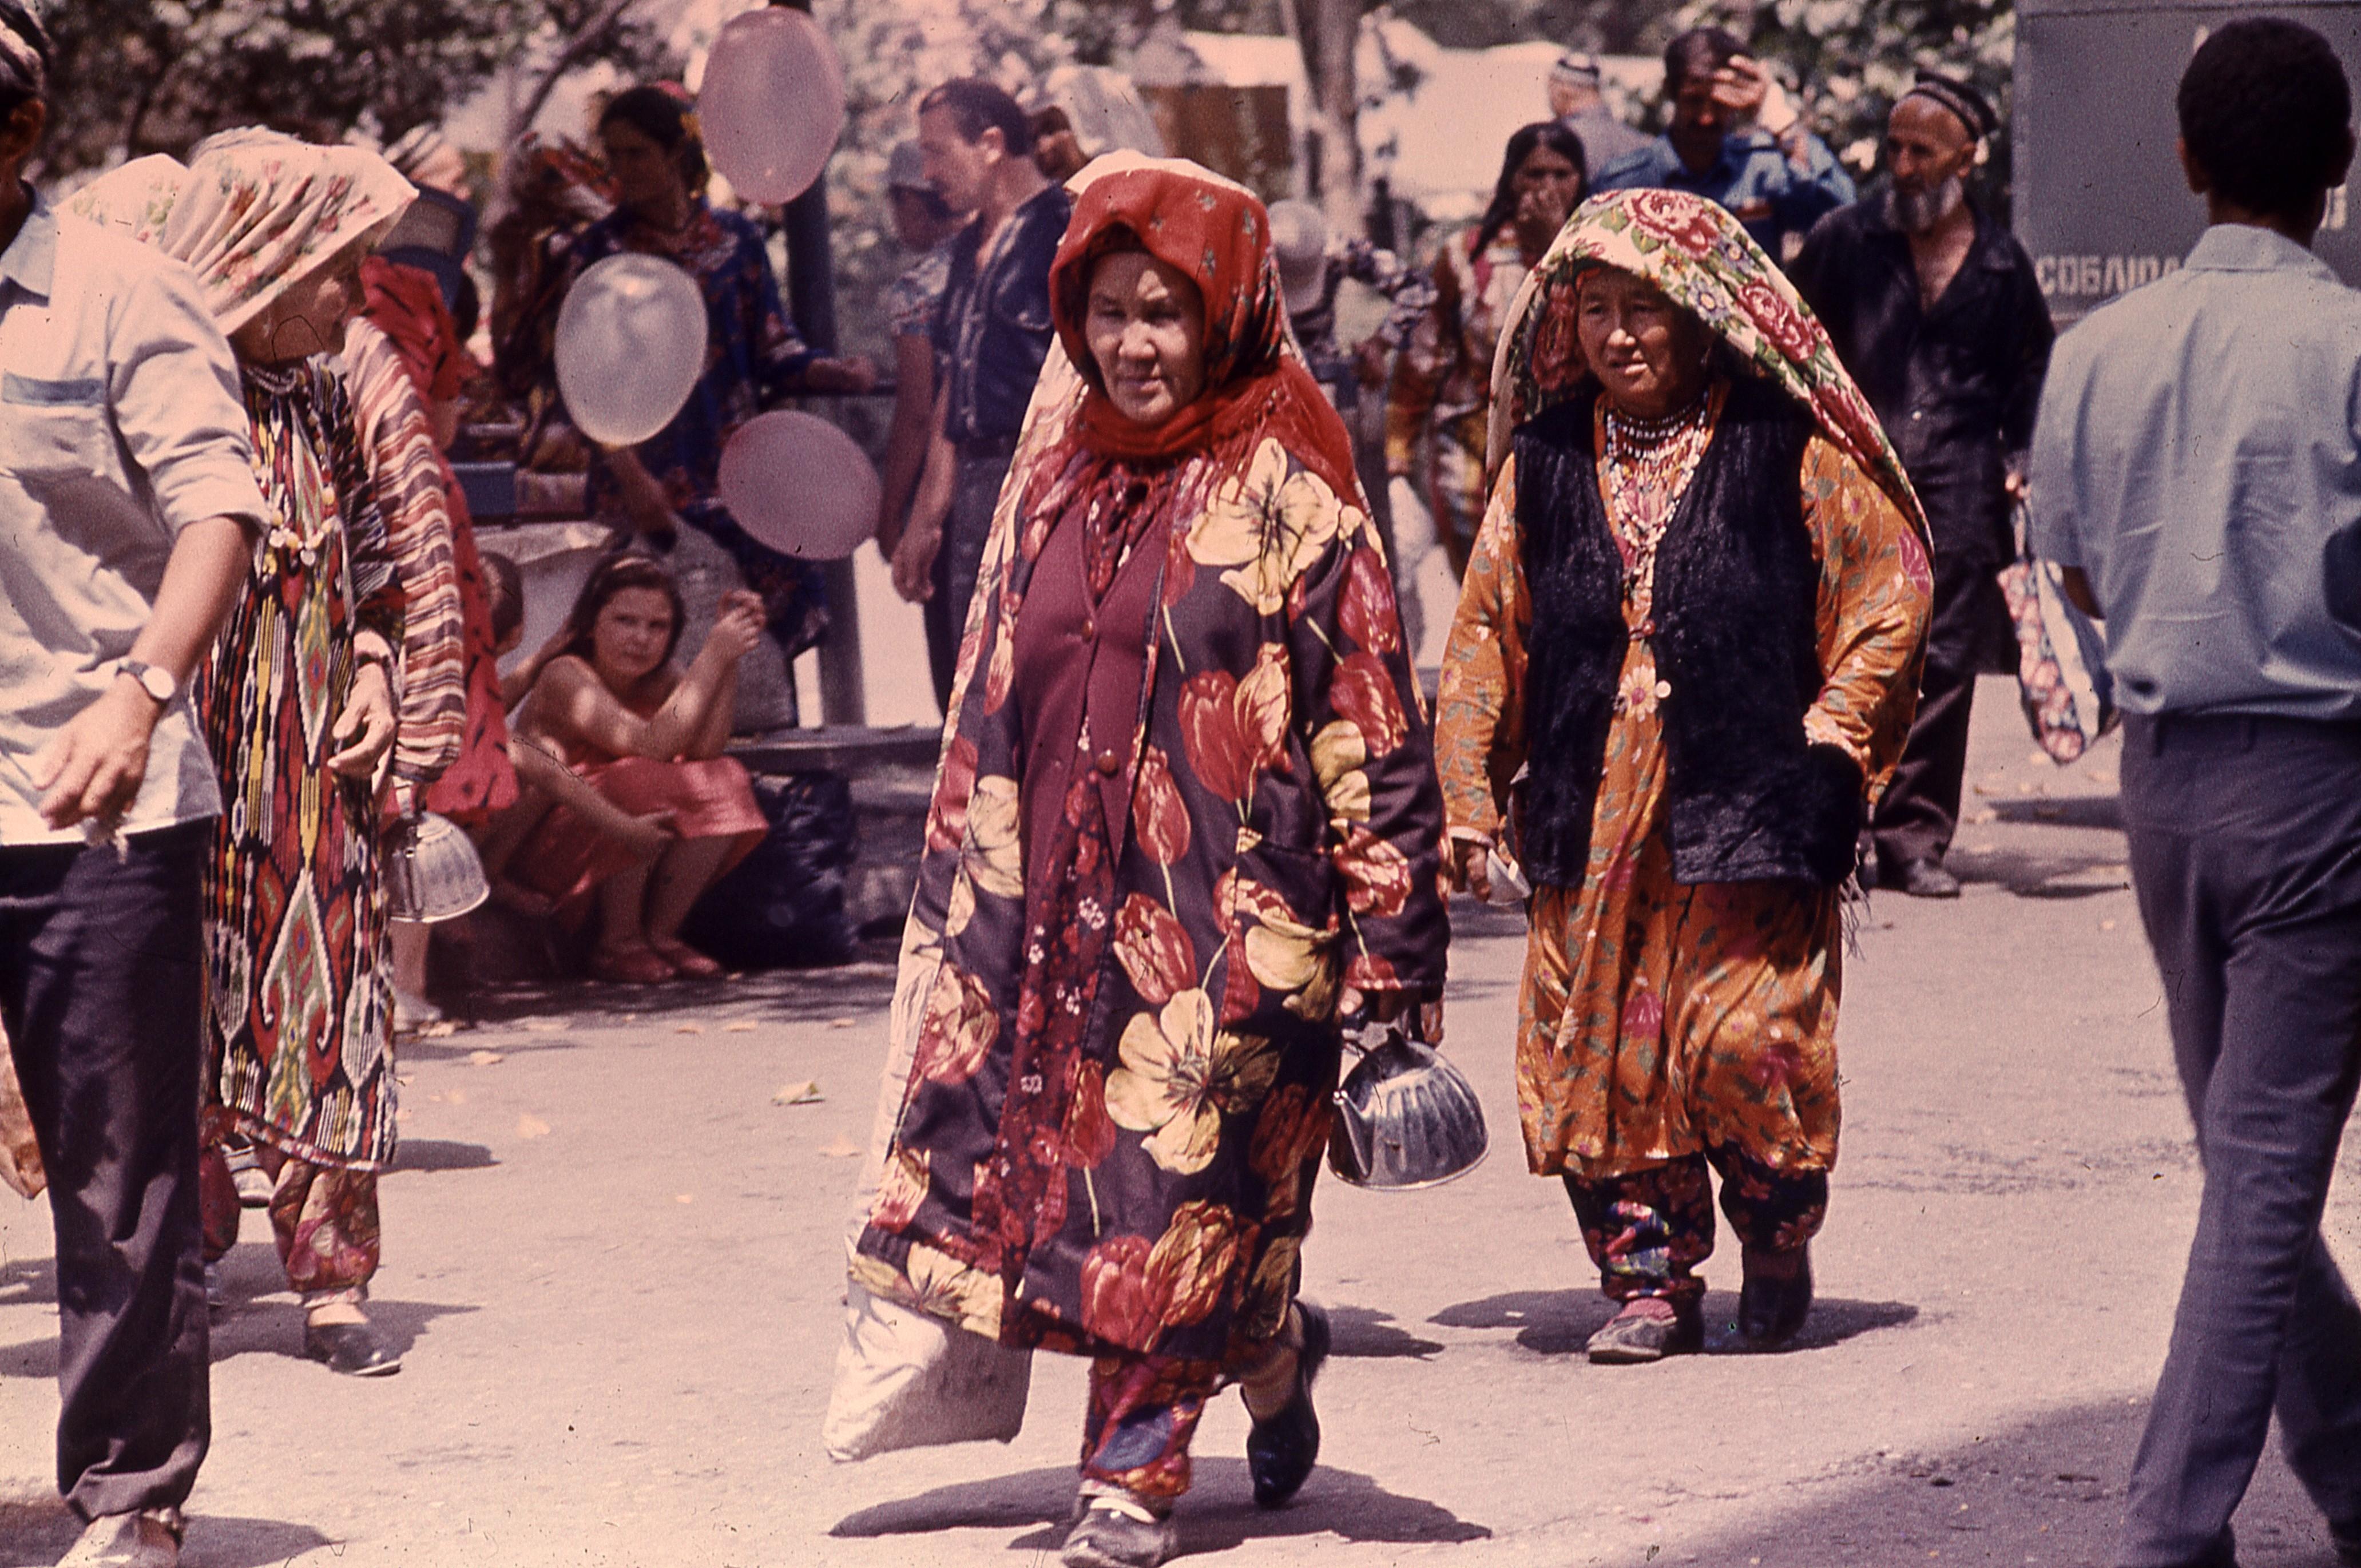 Александр Акилов. Фотография из серии Душанбе-Таджикистан. 1970-1980 (3).jpg